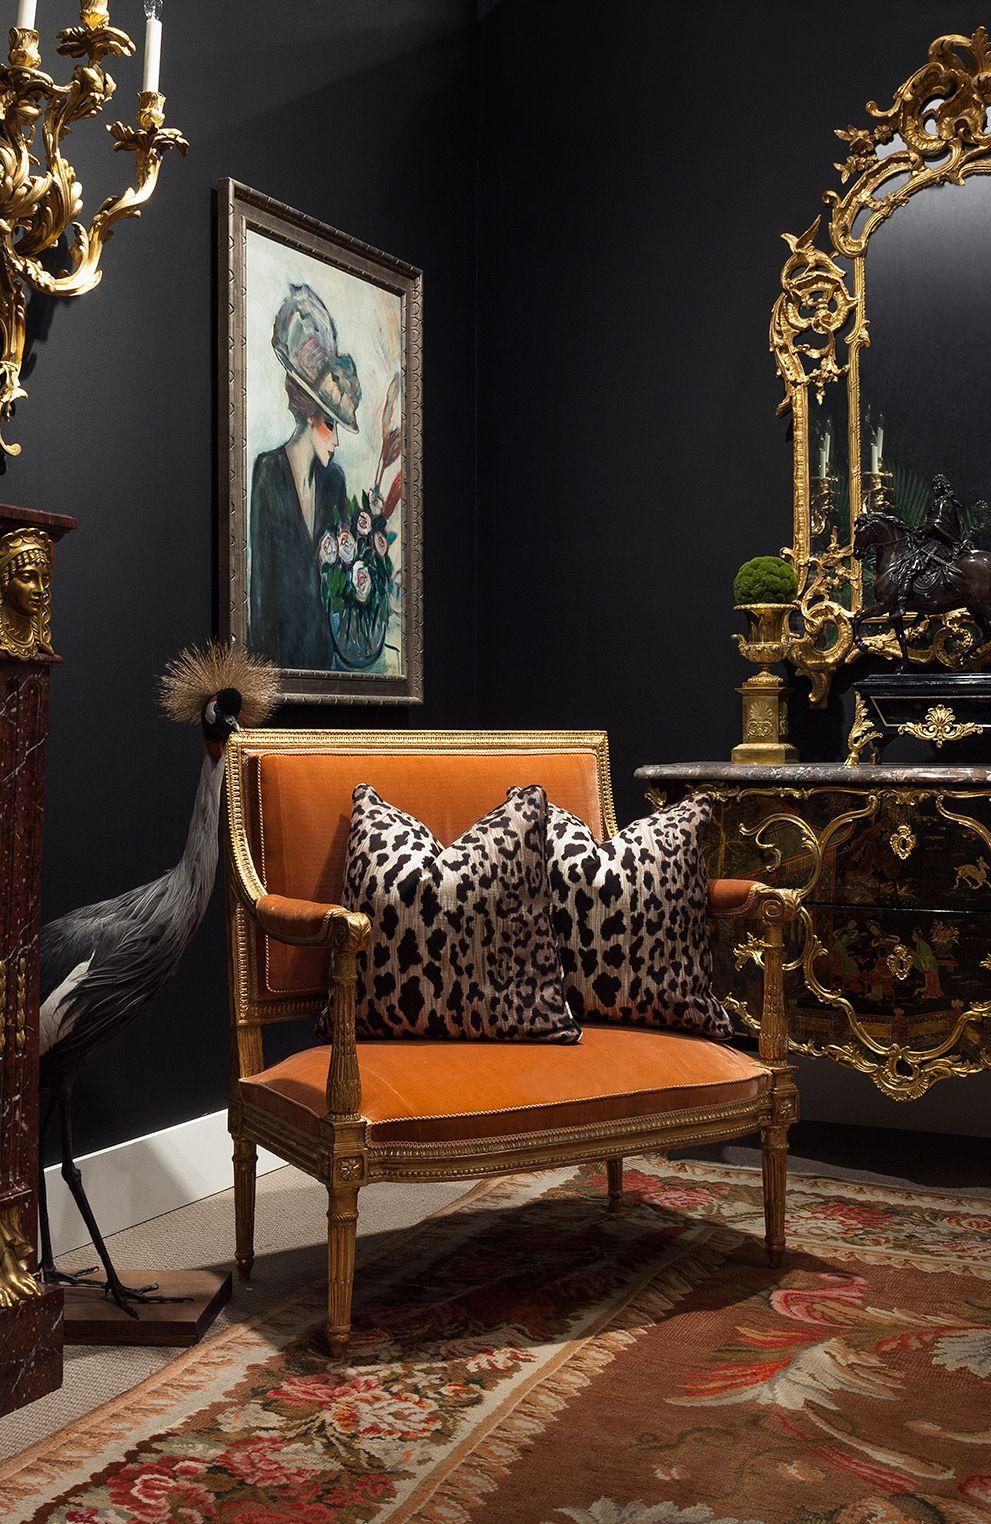 Black And White Interior Design: Beautifully Elegant Sitting Room With Black Walls